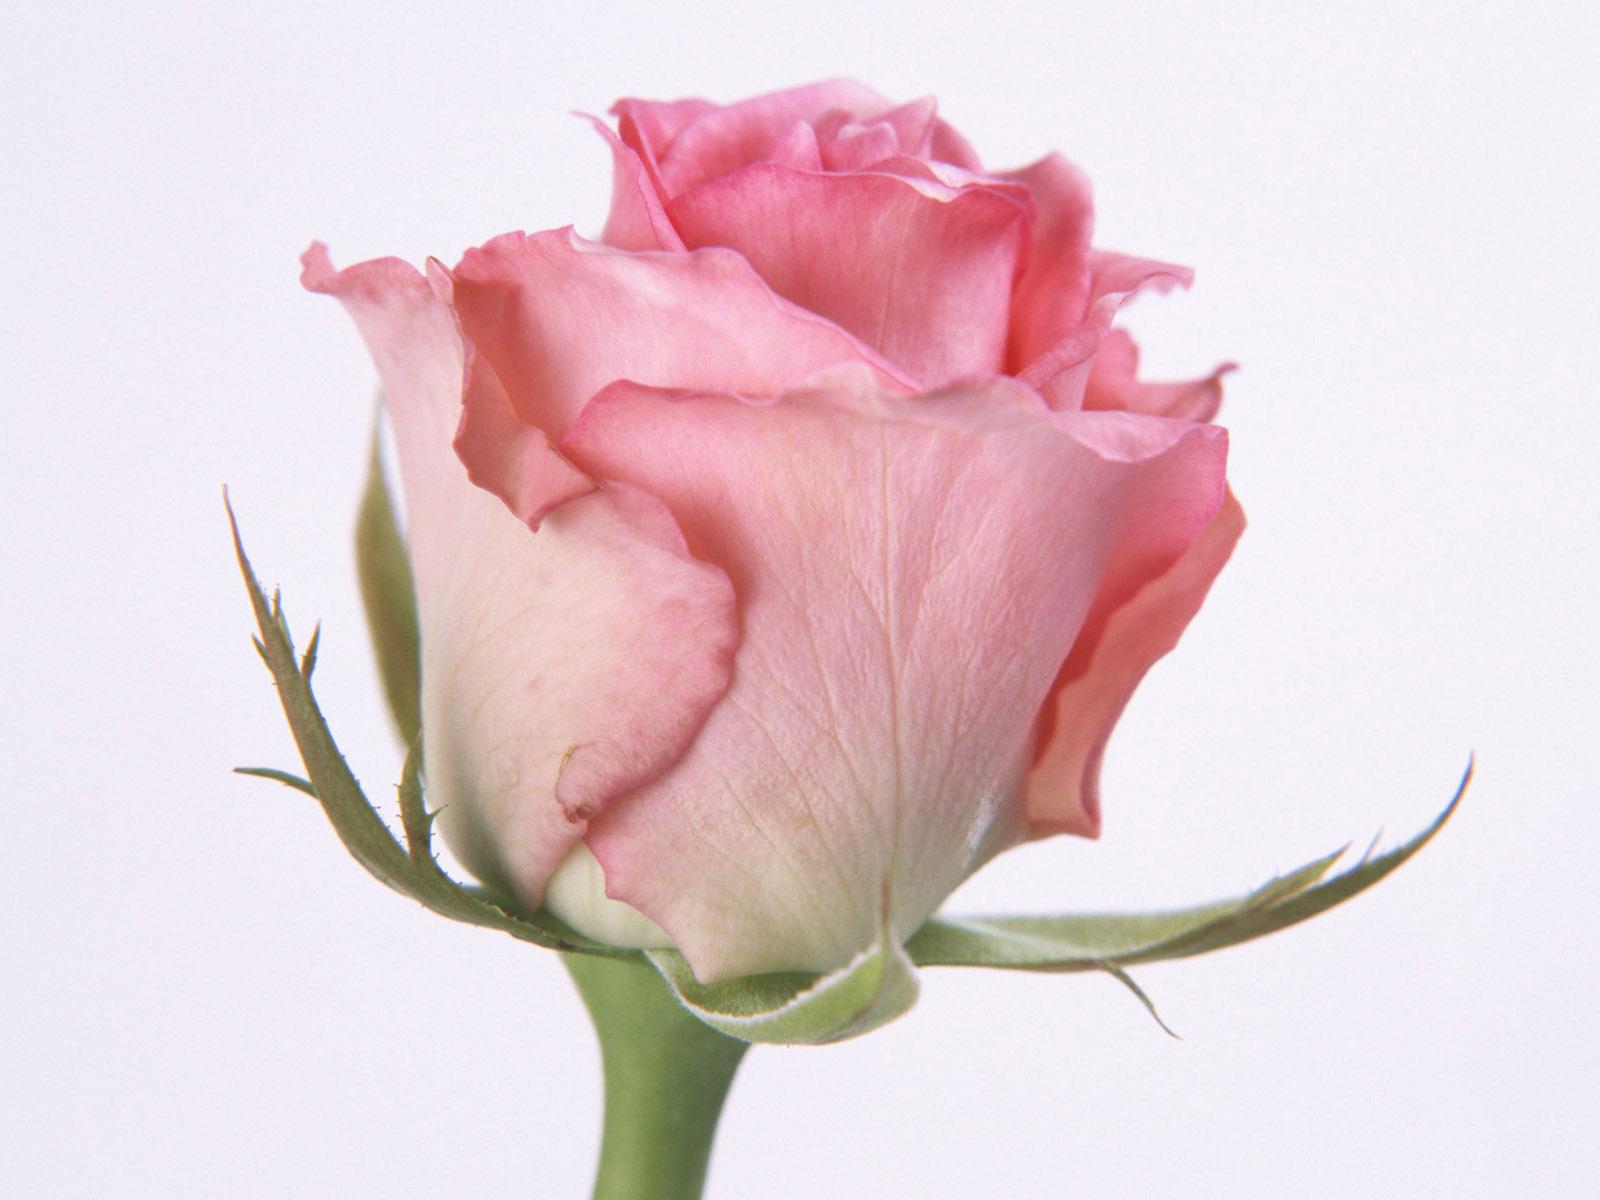 single pink flower rose - photo #32